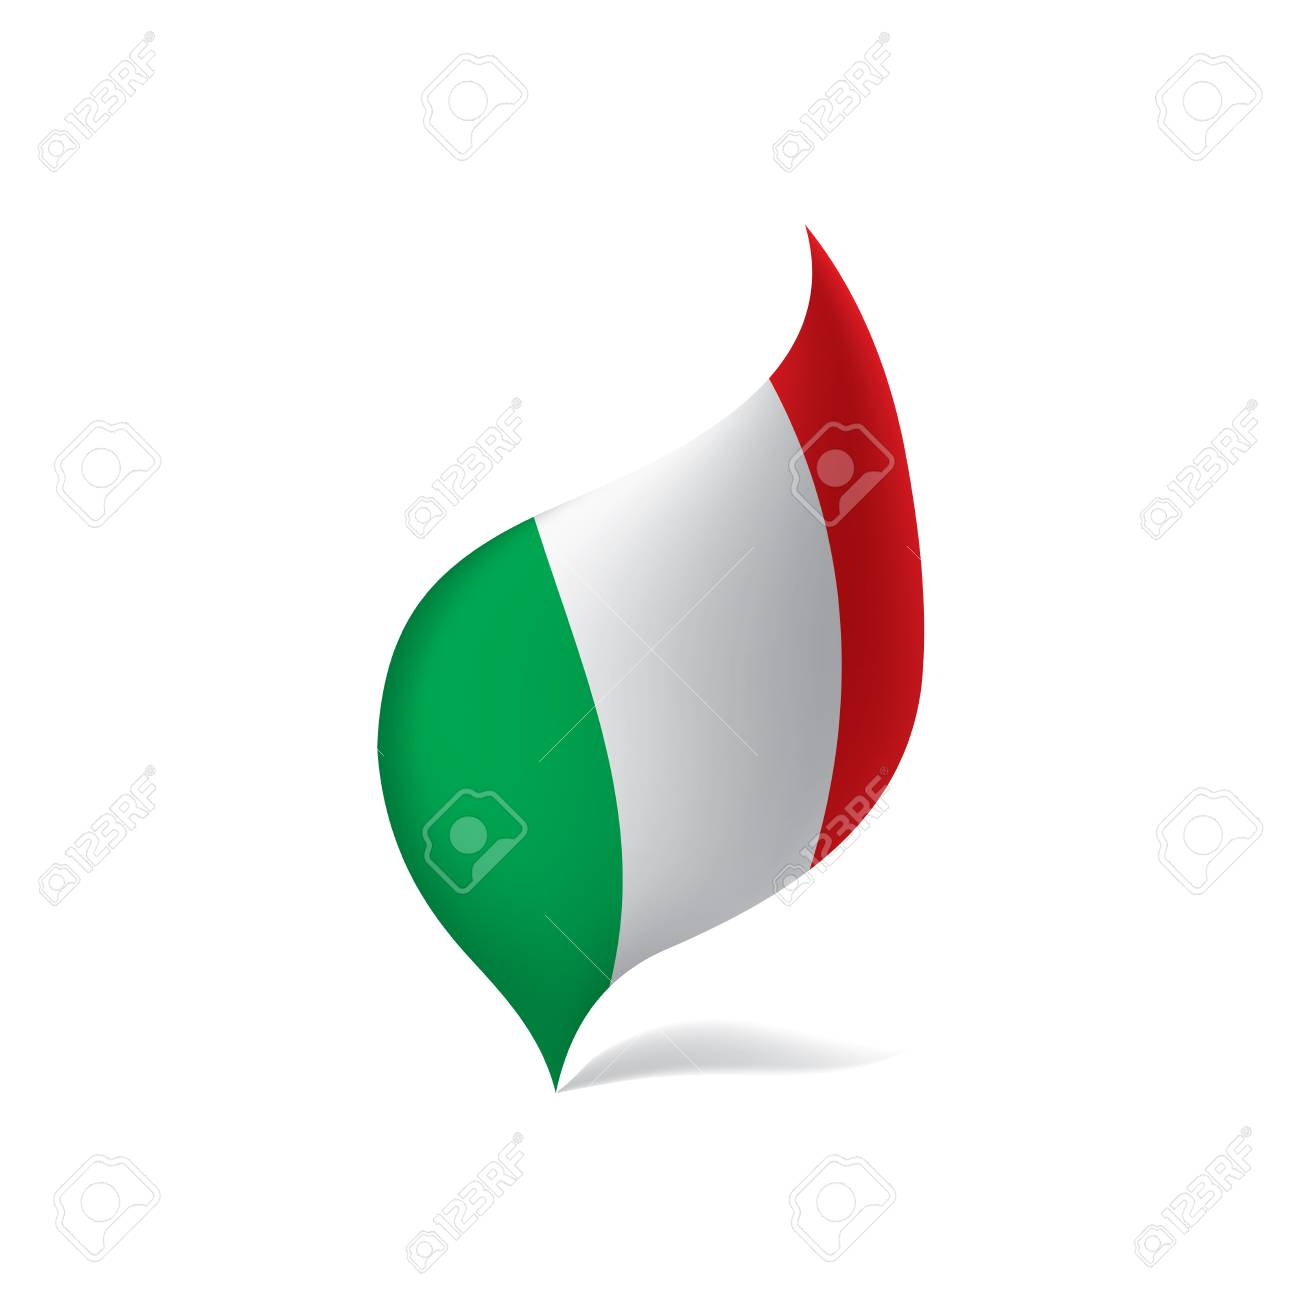 Italy flag, vector illustration - 95200499